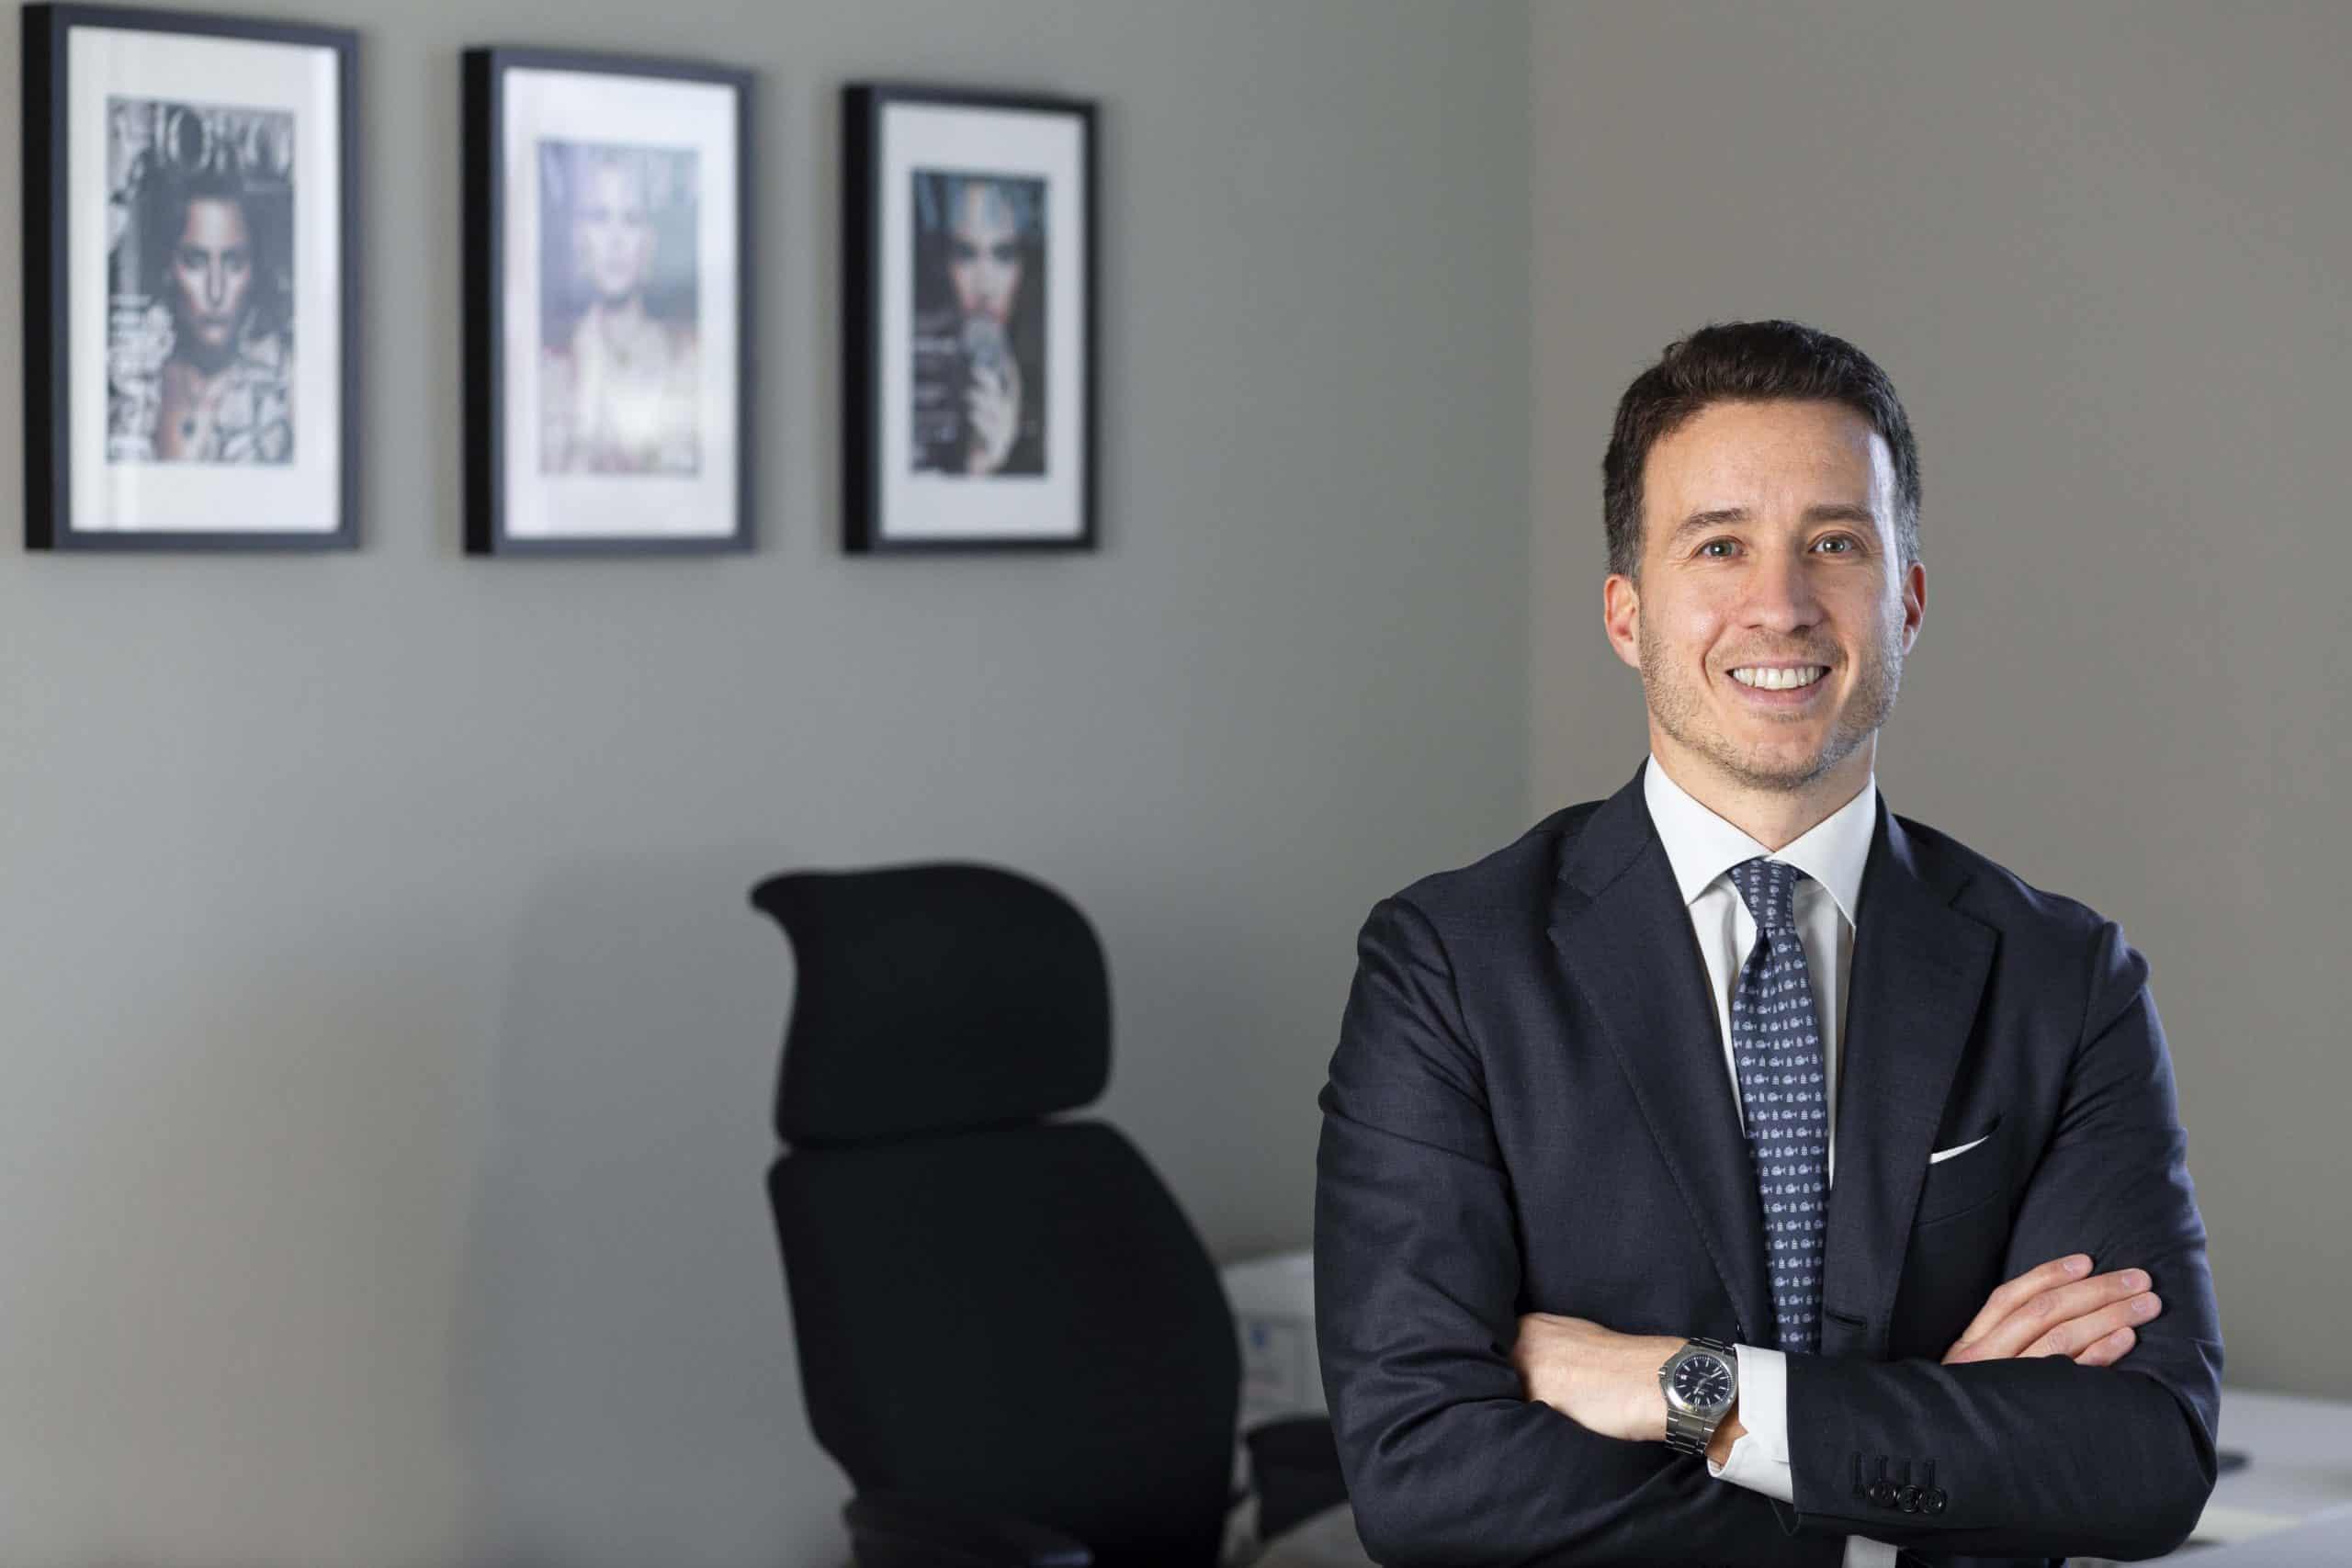 Marco Carniello, IEG Group's Brand Director